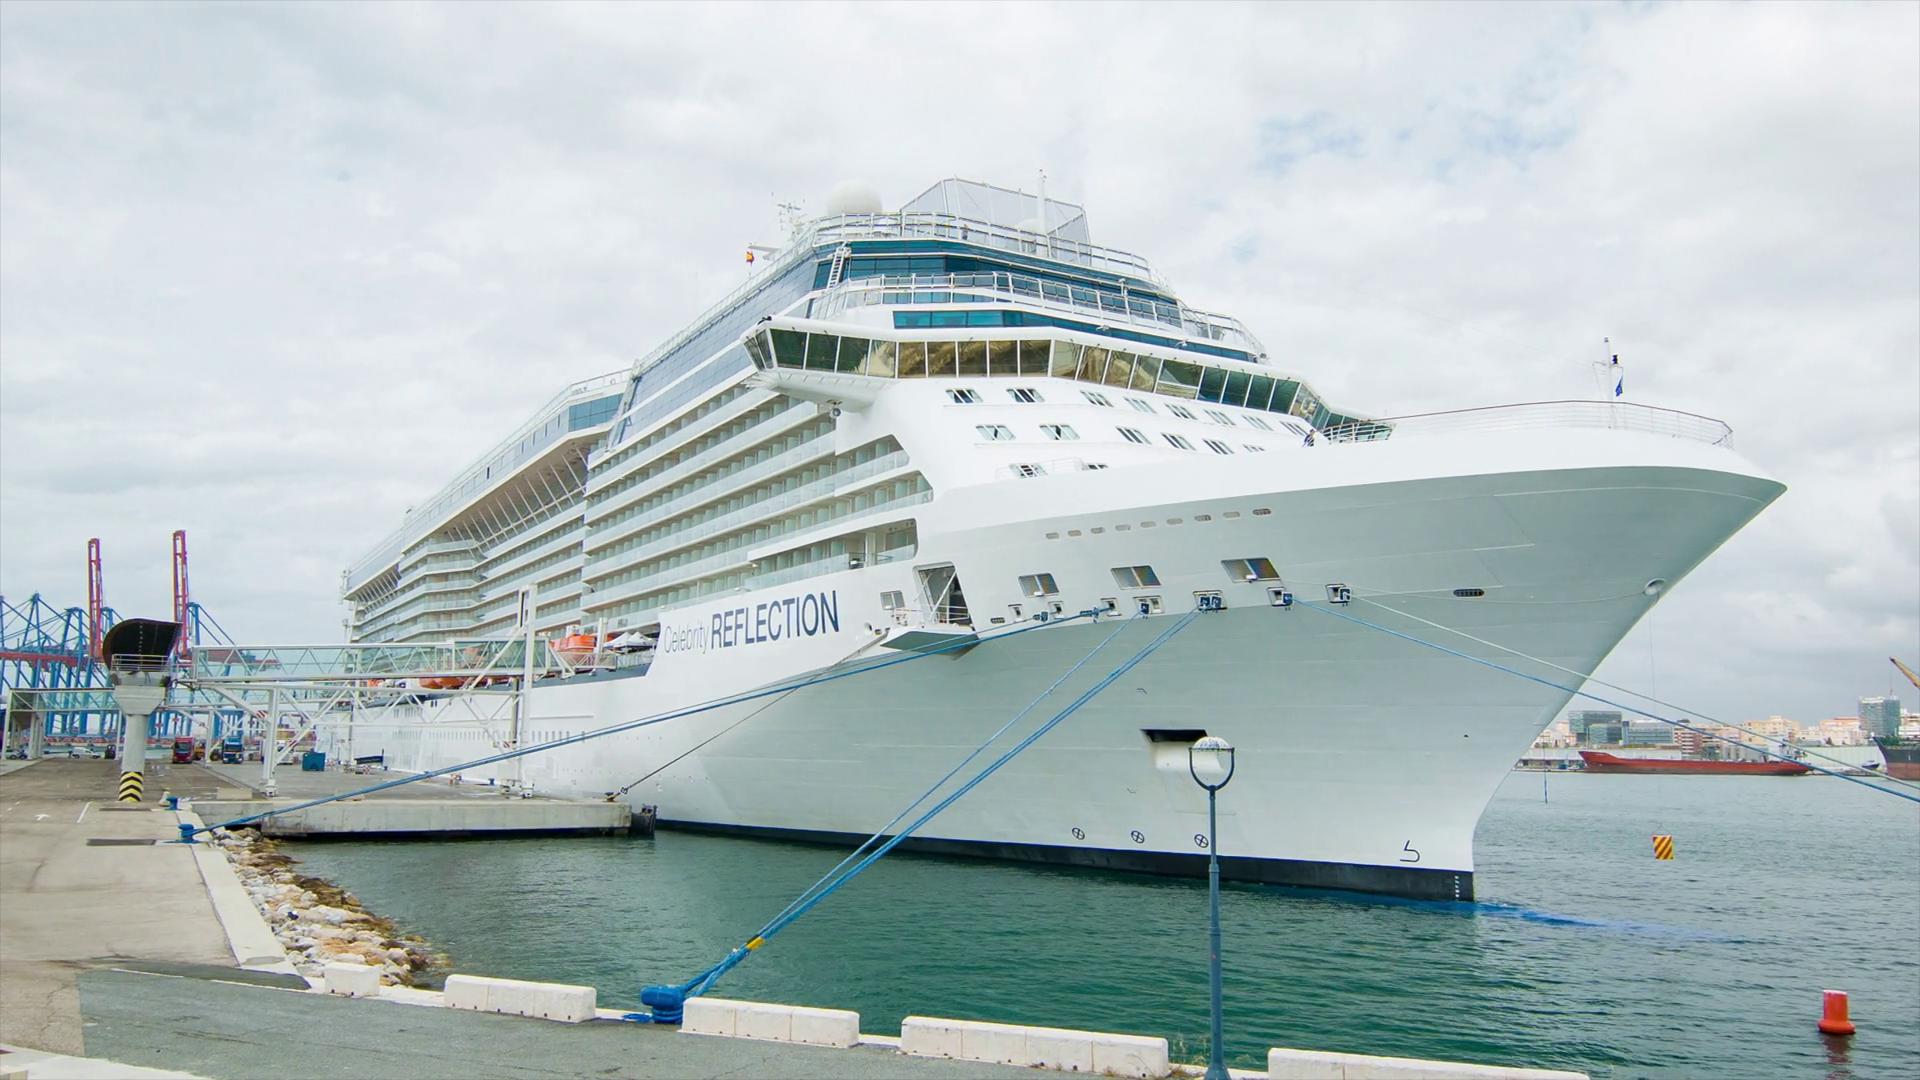 Celebrity Reflection Cruise Ship Docked in Malaga Spain Alongside ...